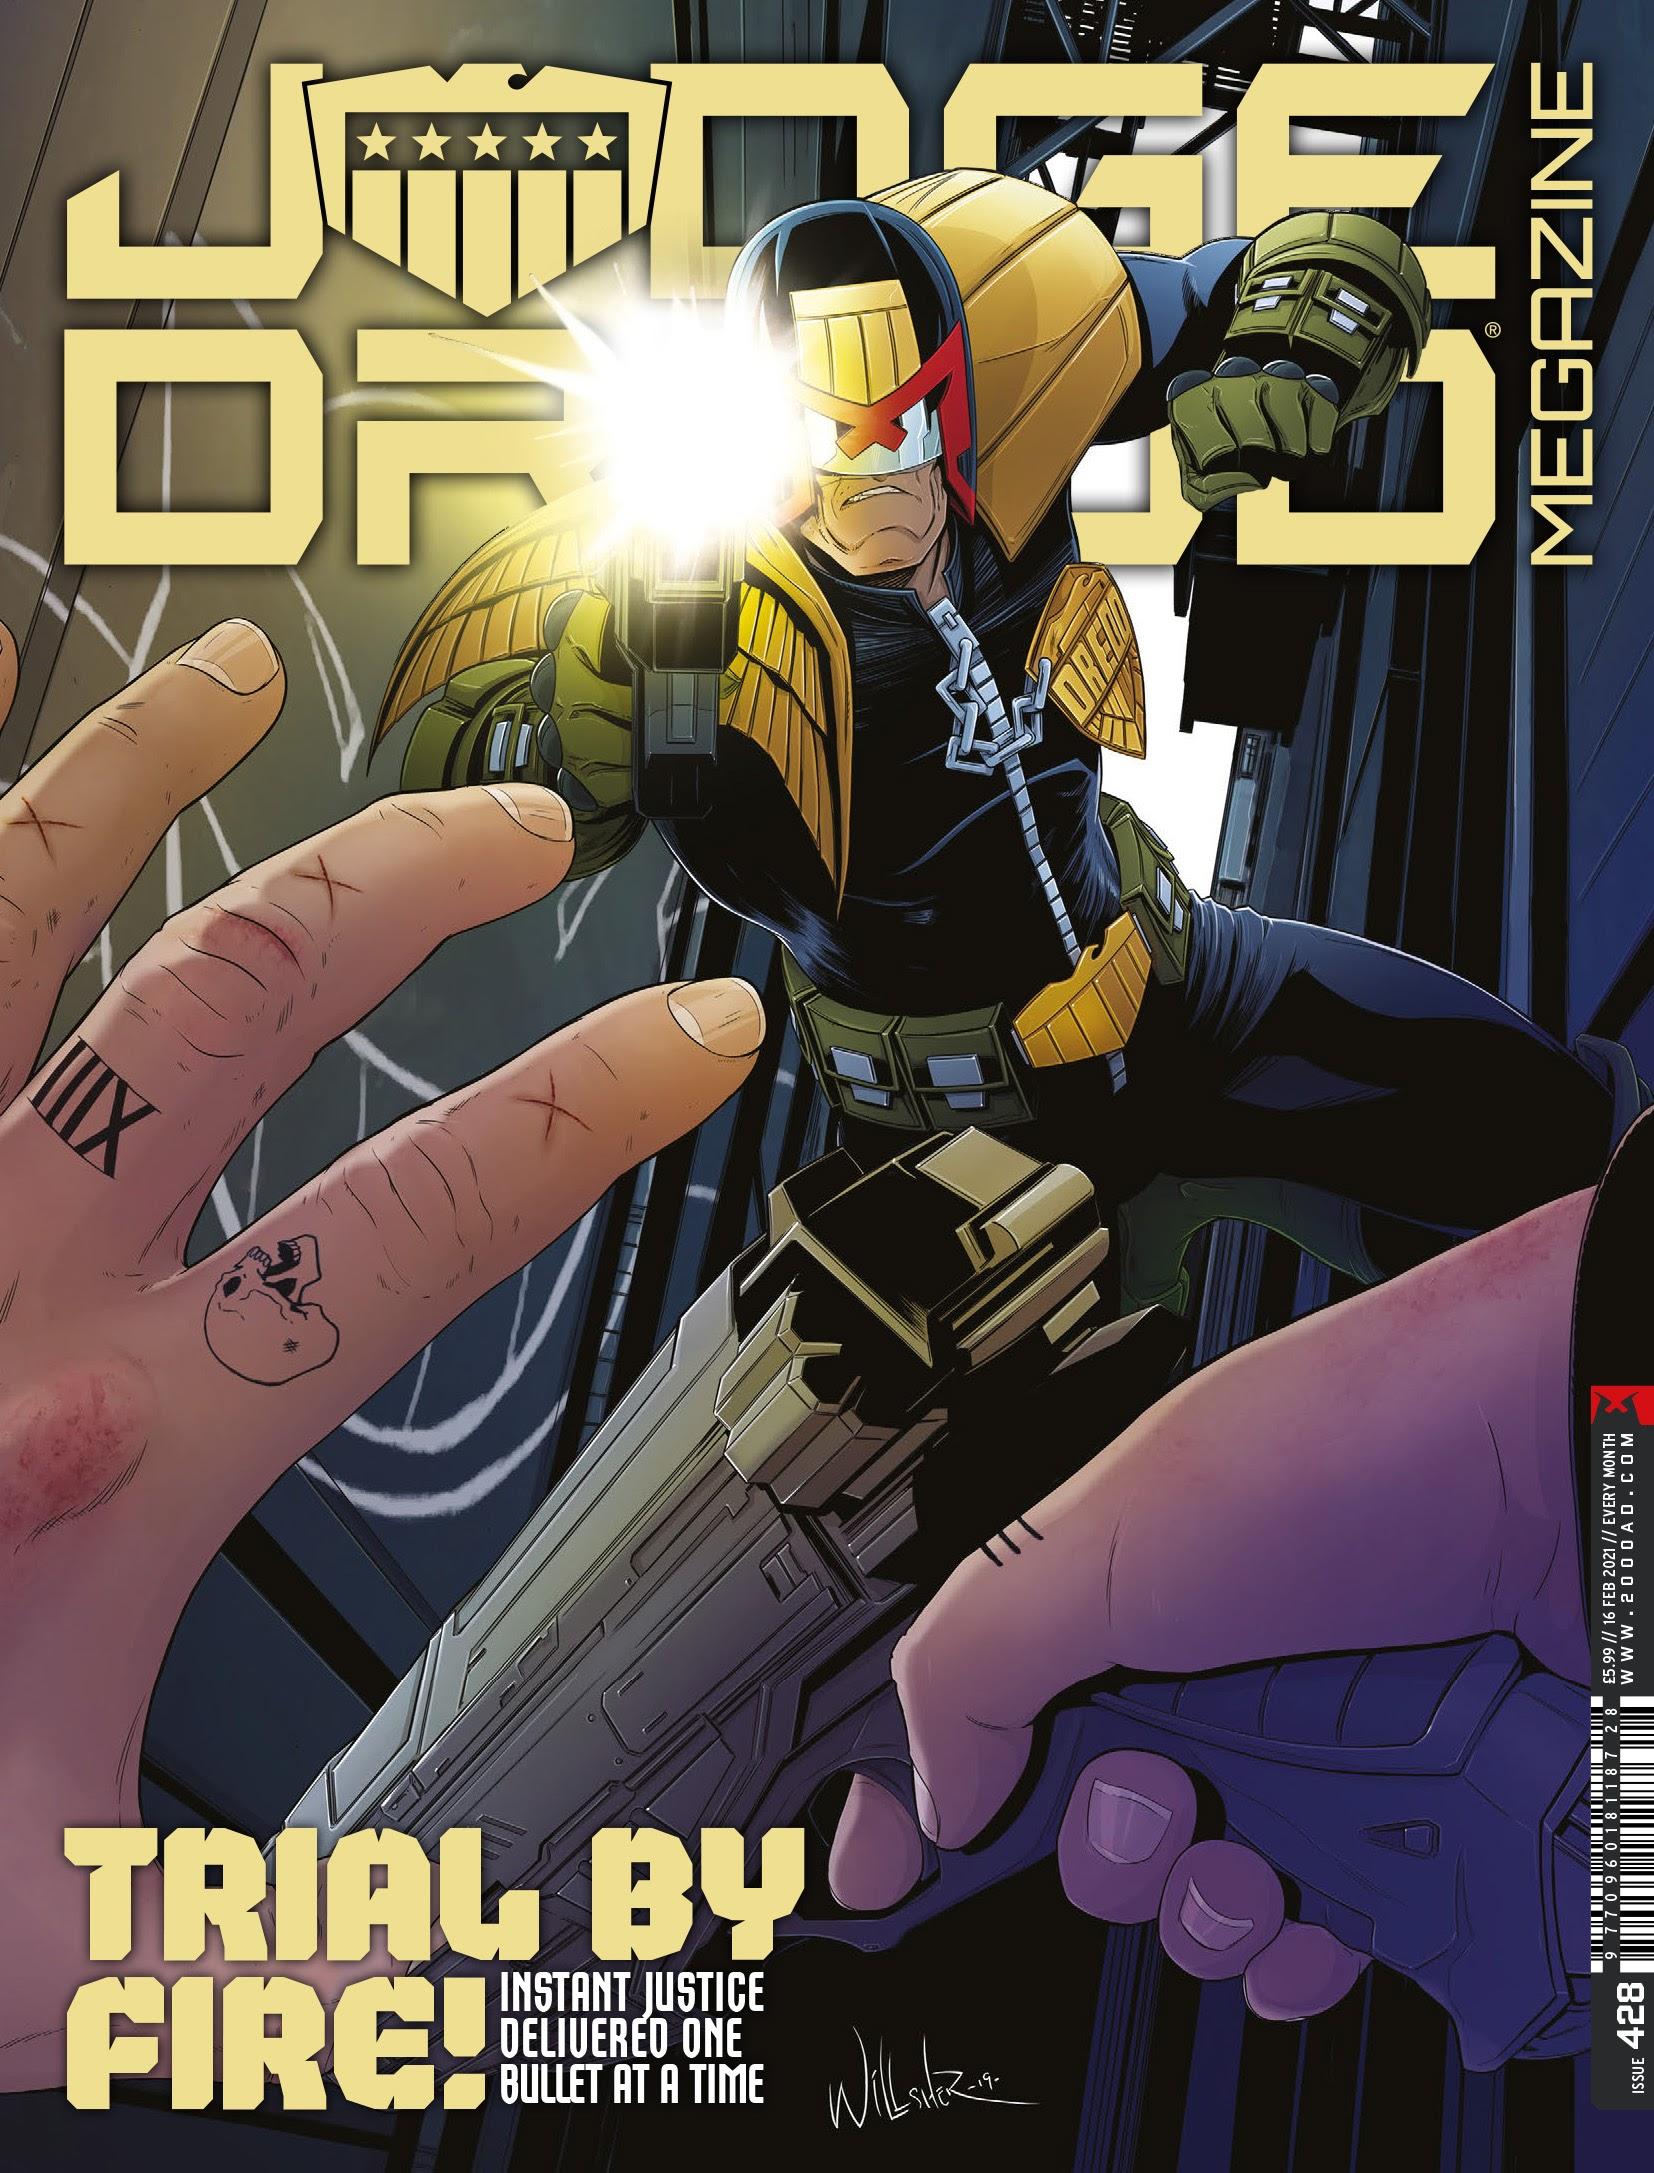 Judge Dredd Megazine (Vol. 5) issue 428 - Page 1